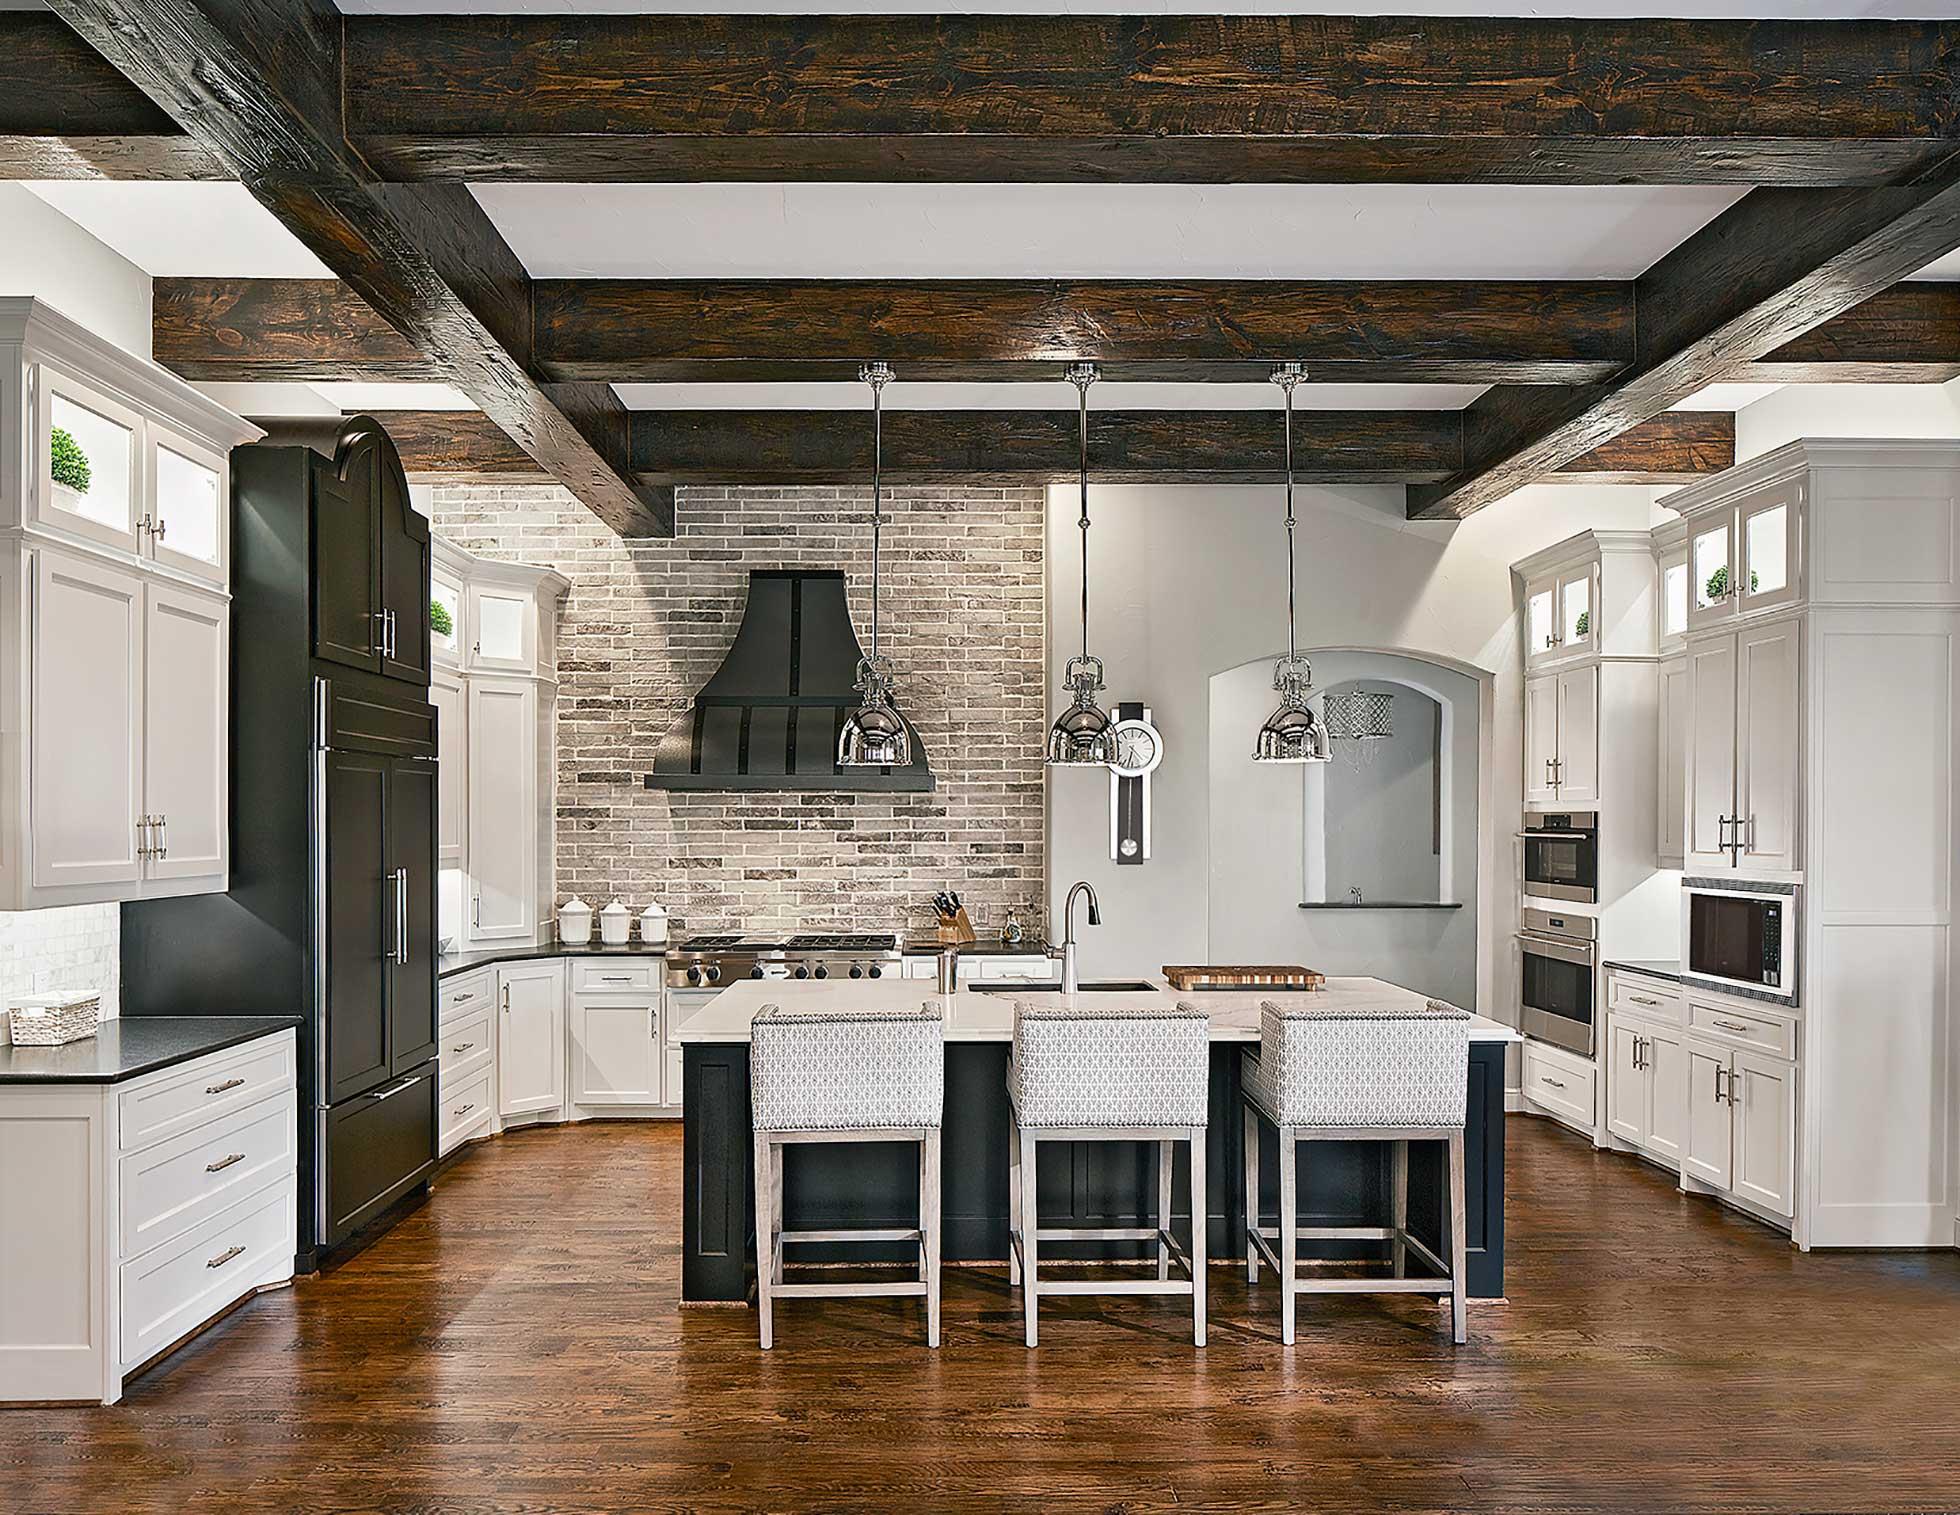 Kitchen Design & Remodeling Company- USI Remodeling-Southlake TX